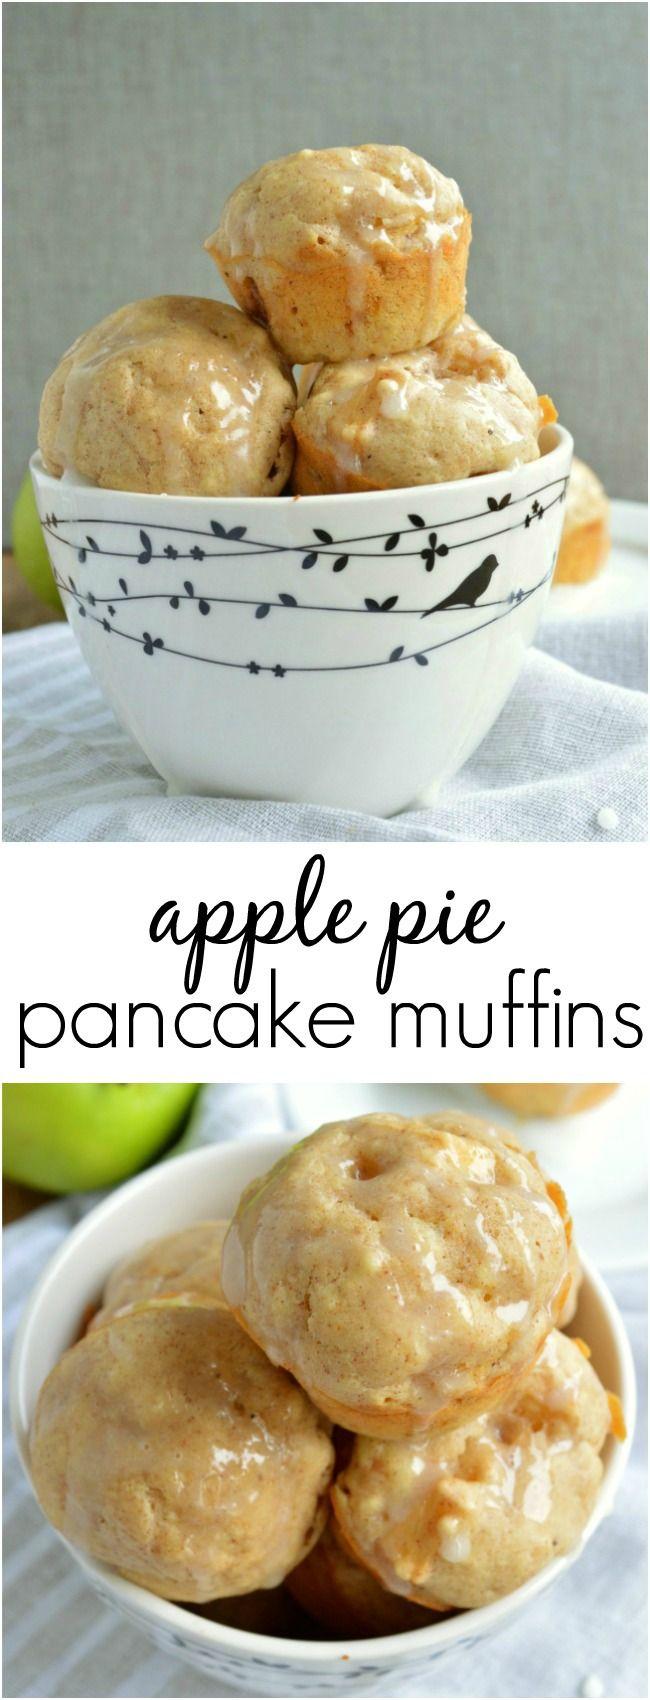 25+ best ideas about Breakfast tailgate food on Pinterest ...